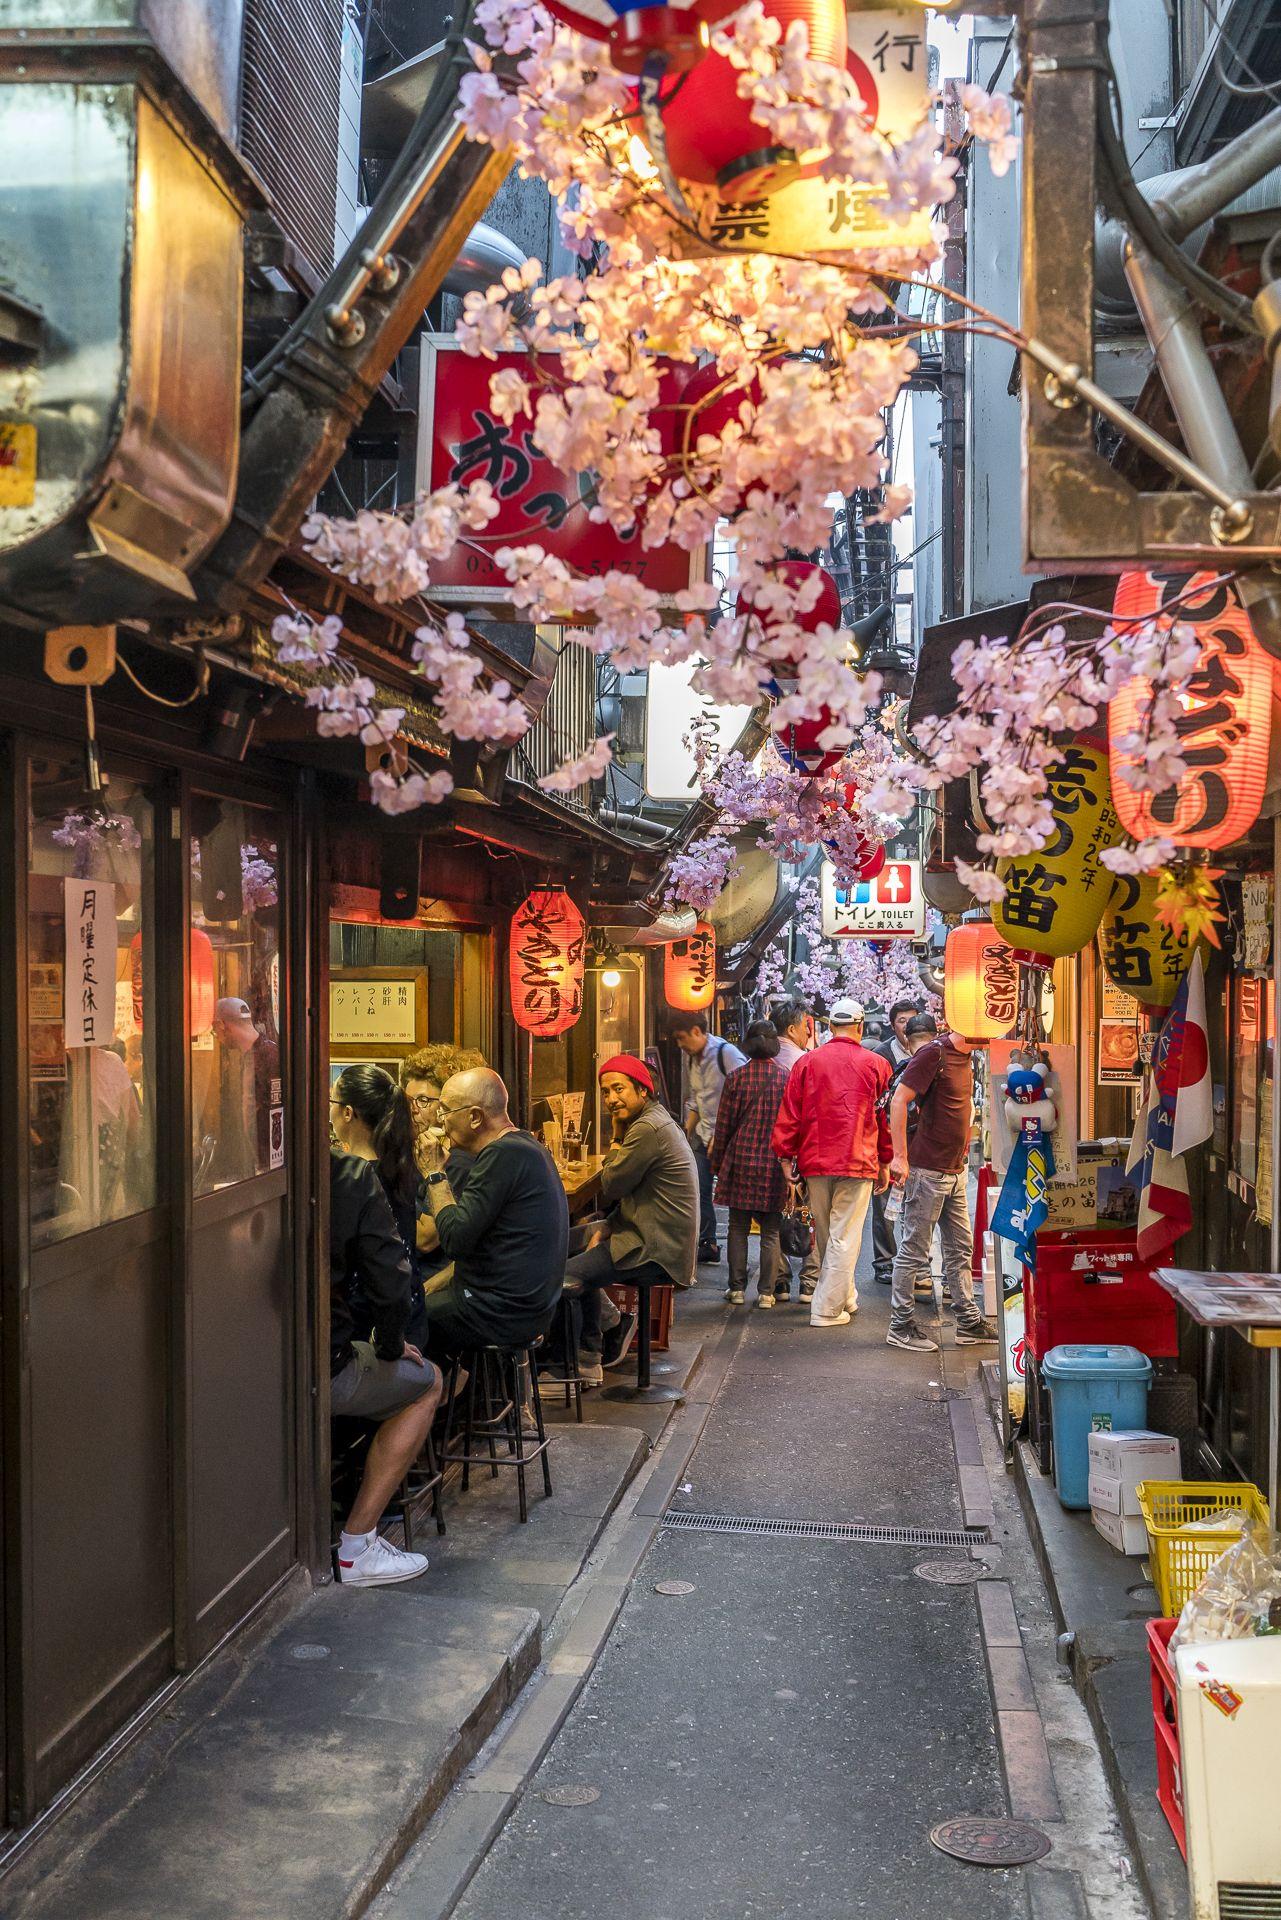 Tokio Sehenswurdigkeiten Meine Reisetipps Fur Die Mega Metropole Tokio Reisen Japan Reisen